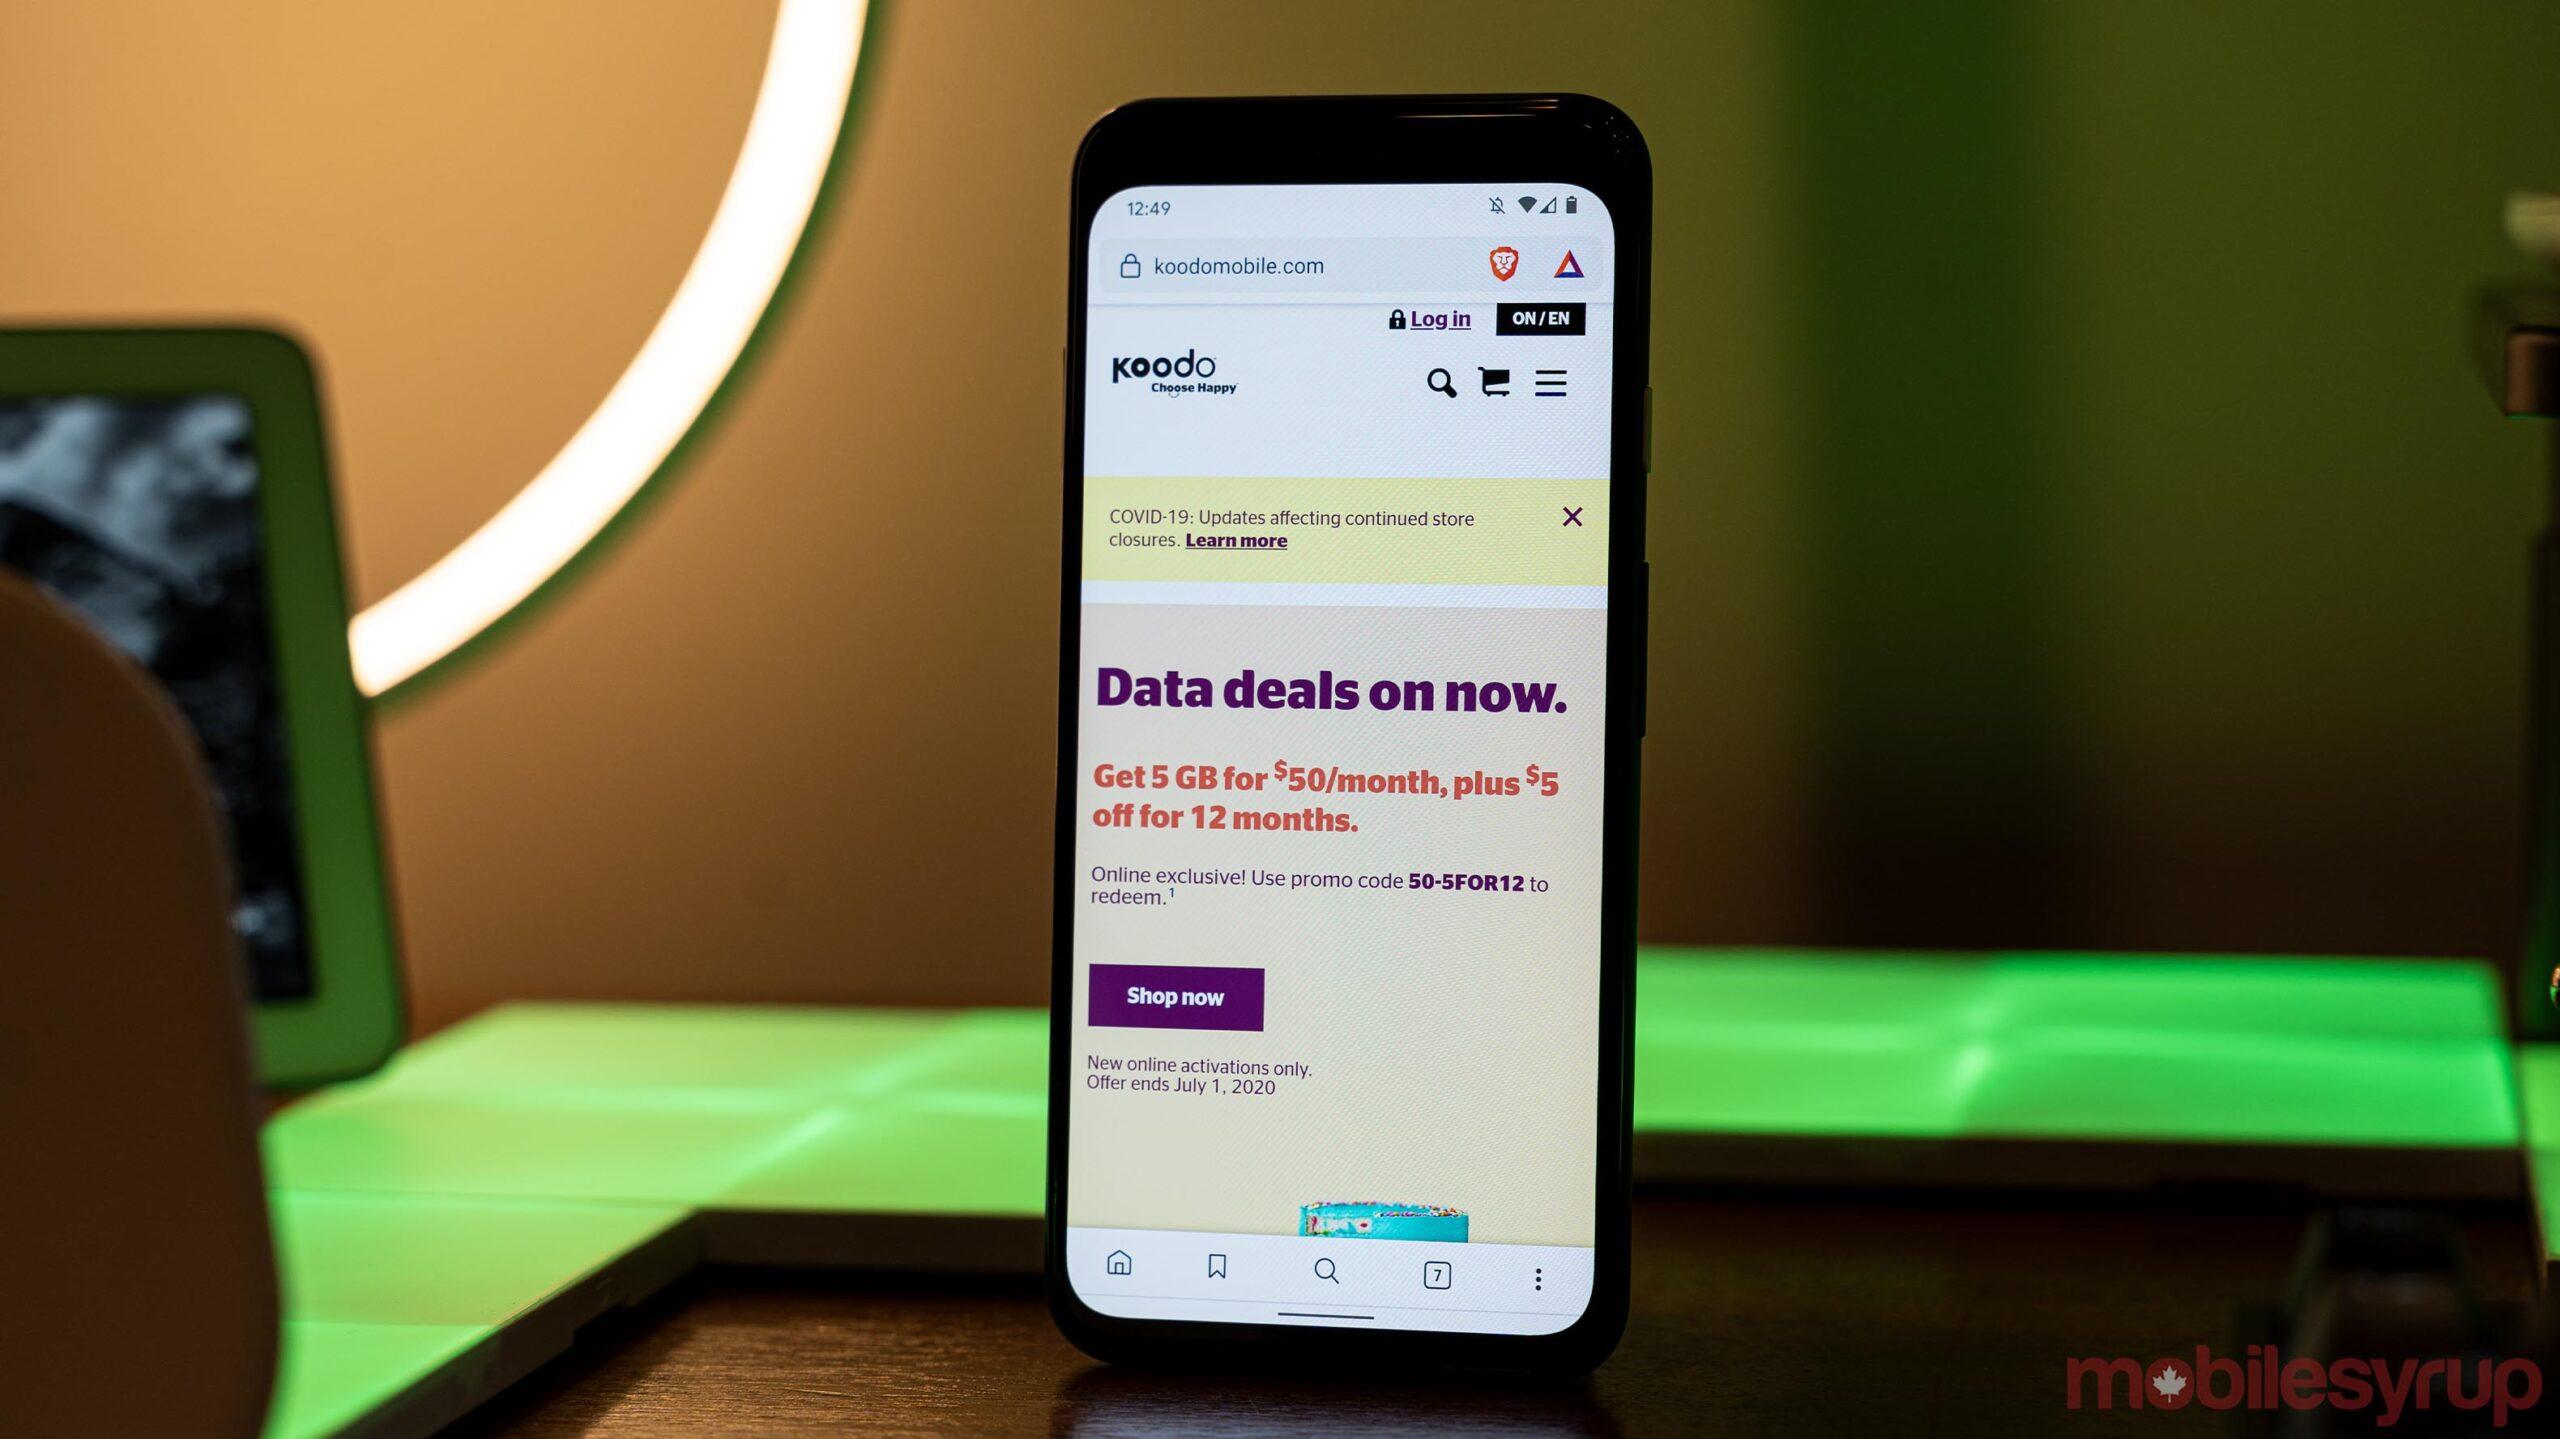 Koodo website on a smartphone